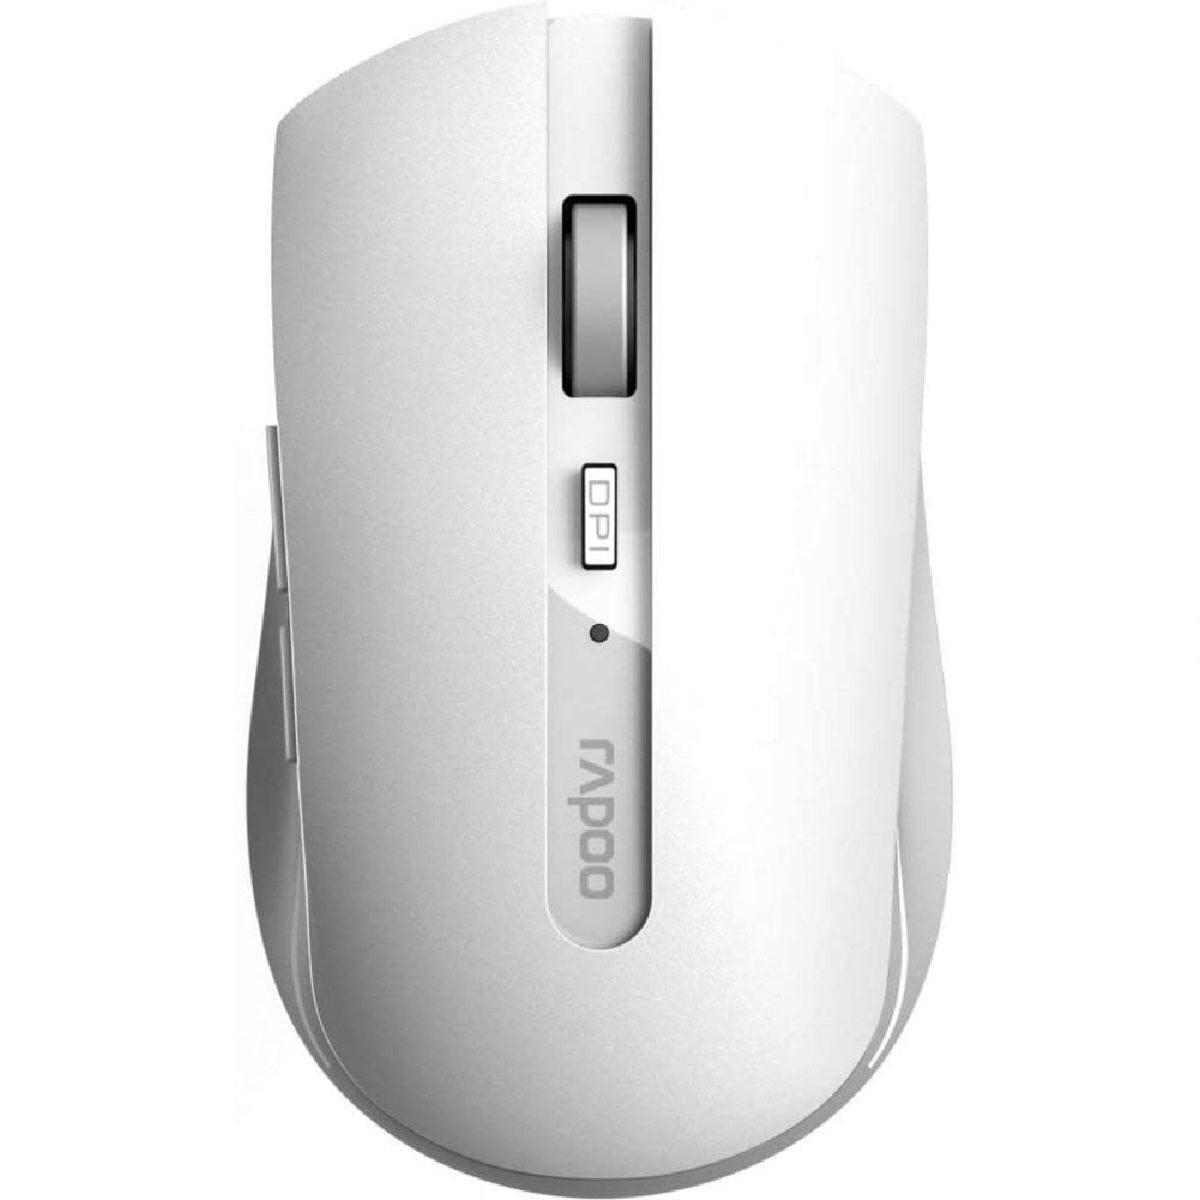 Rapoo 7200M Wireless Multi-Mode Optical Mouse - White